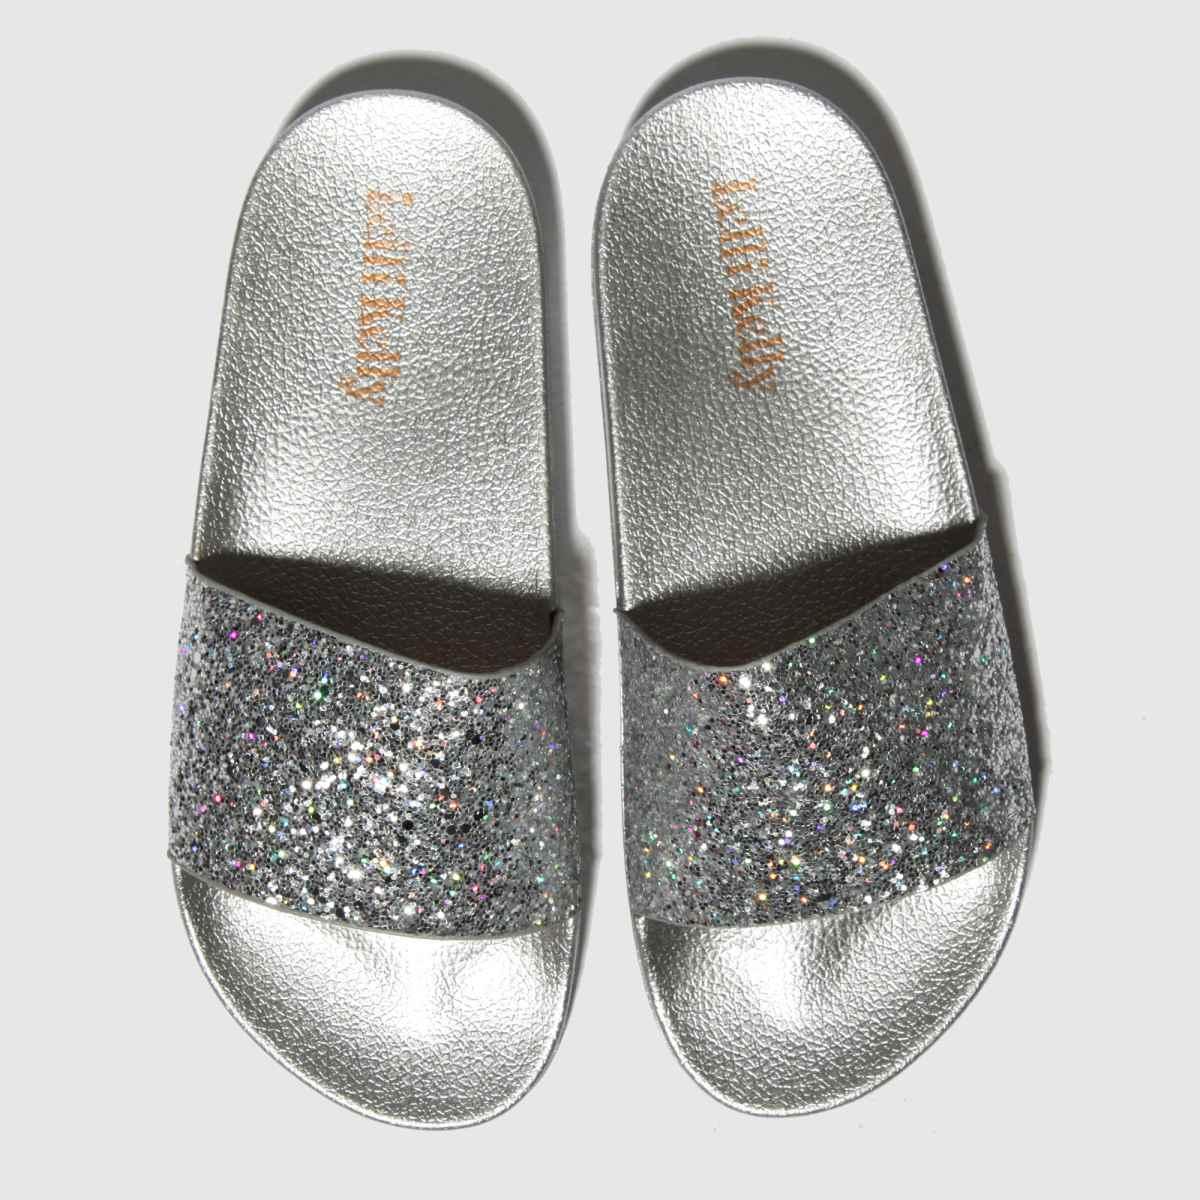 Lelli Kelly Silver Marina Sandals Junior